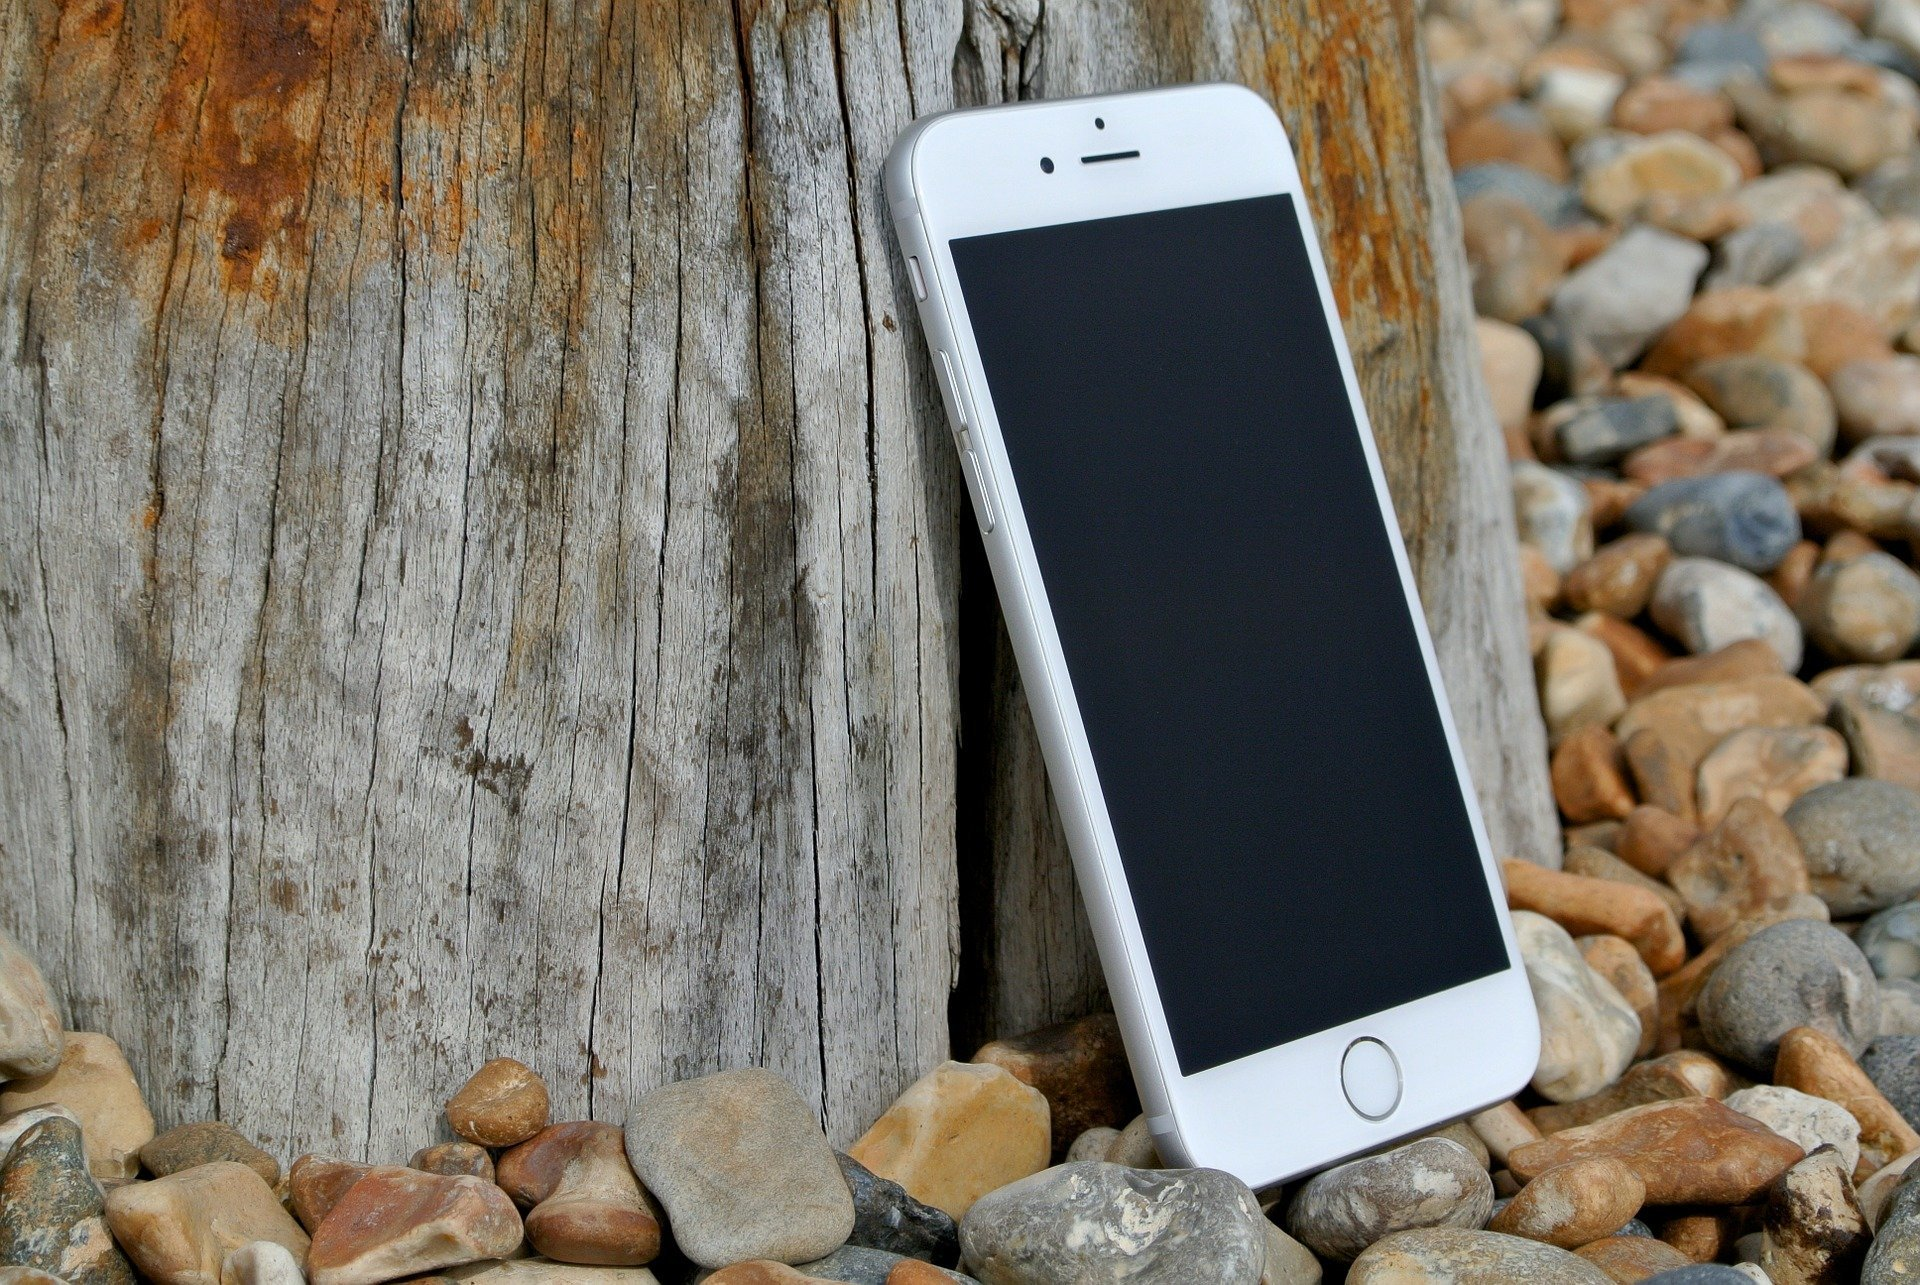 Bericht: Apple startet iPhone-Fertigung in Indien